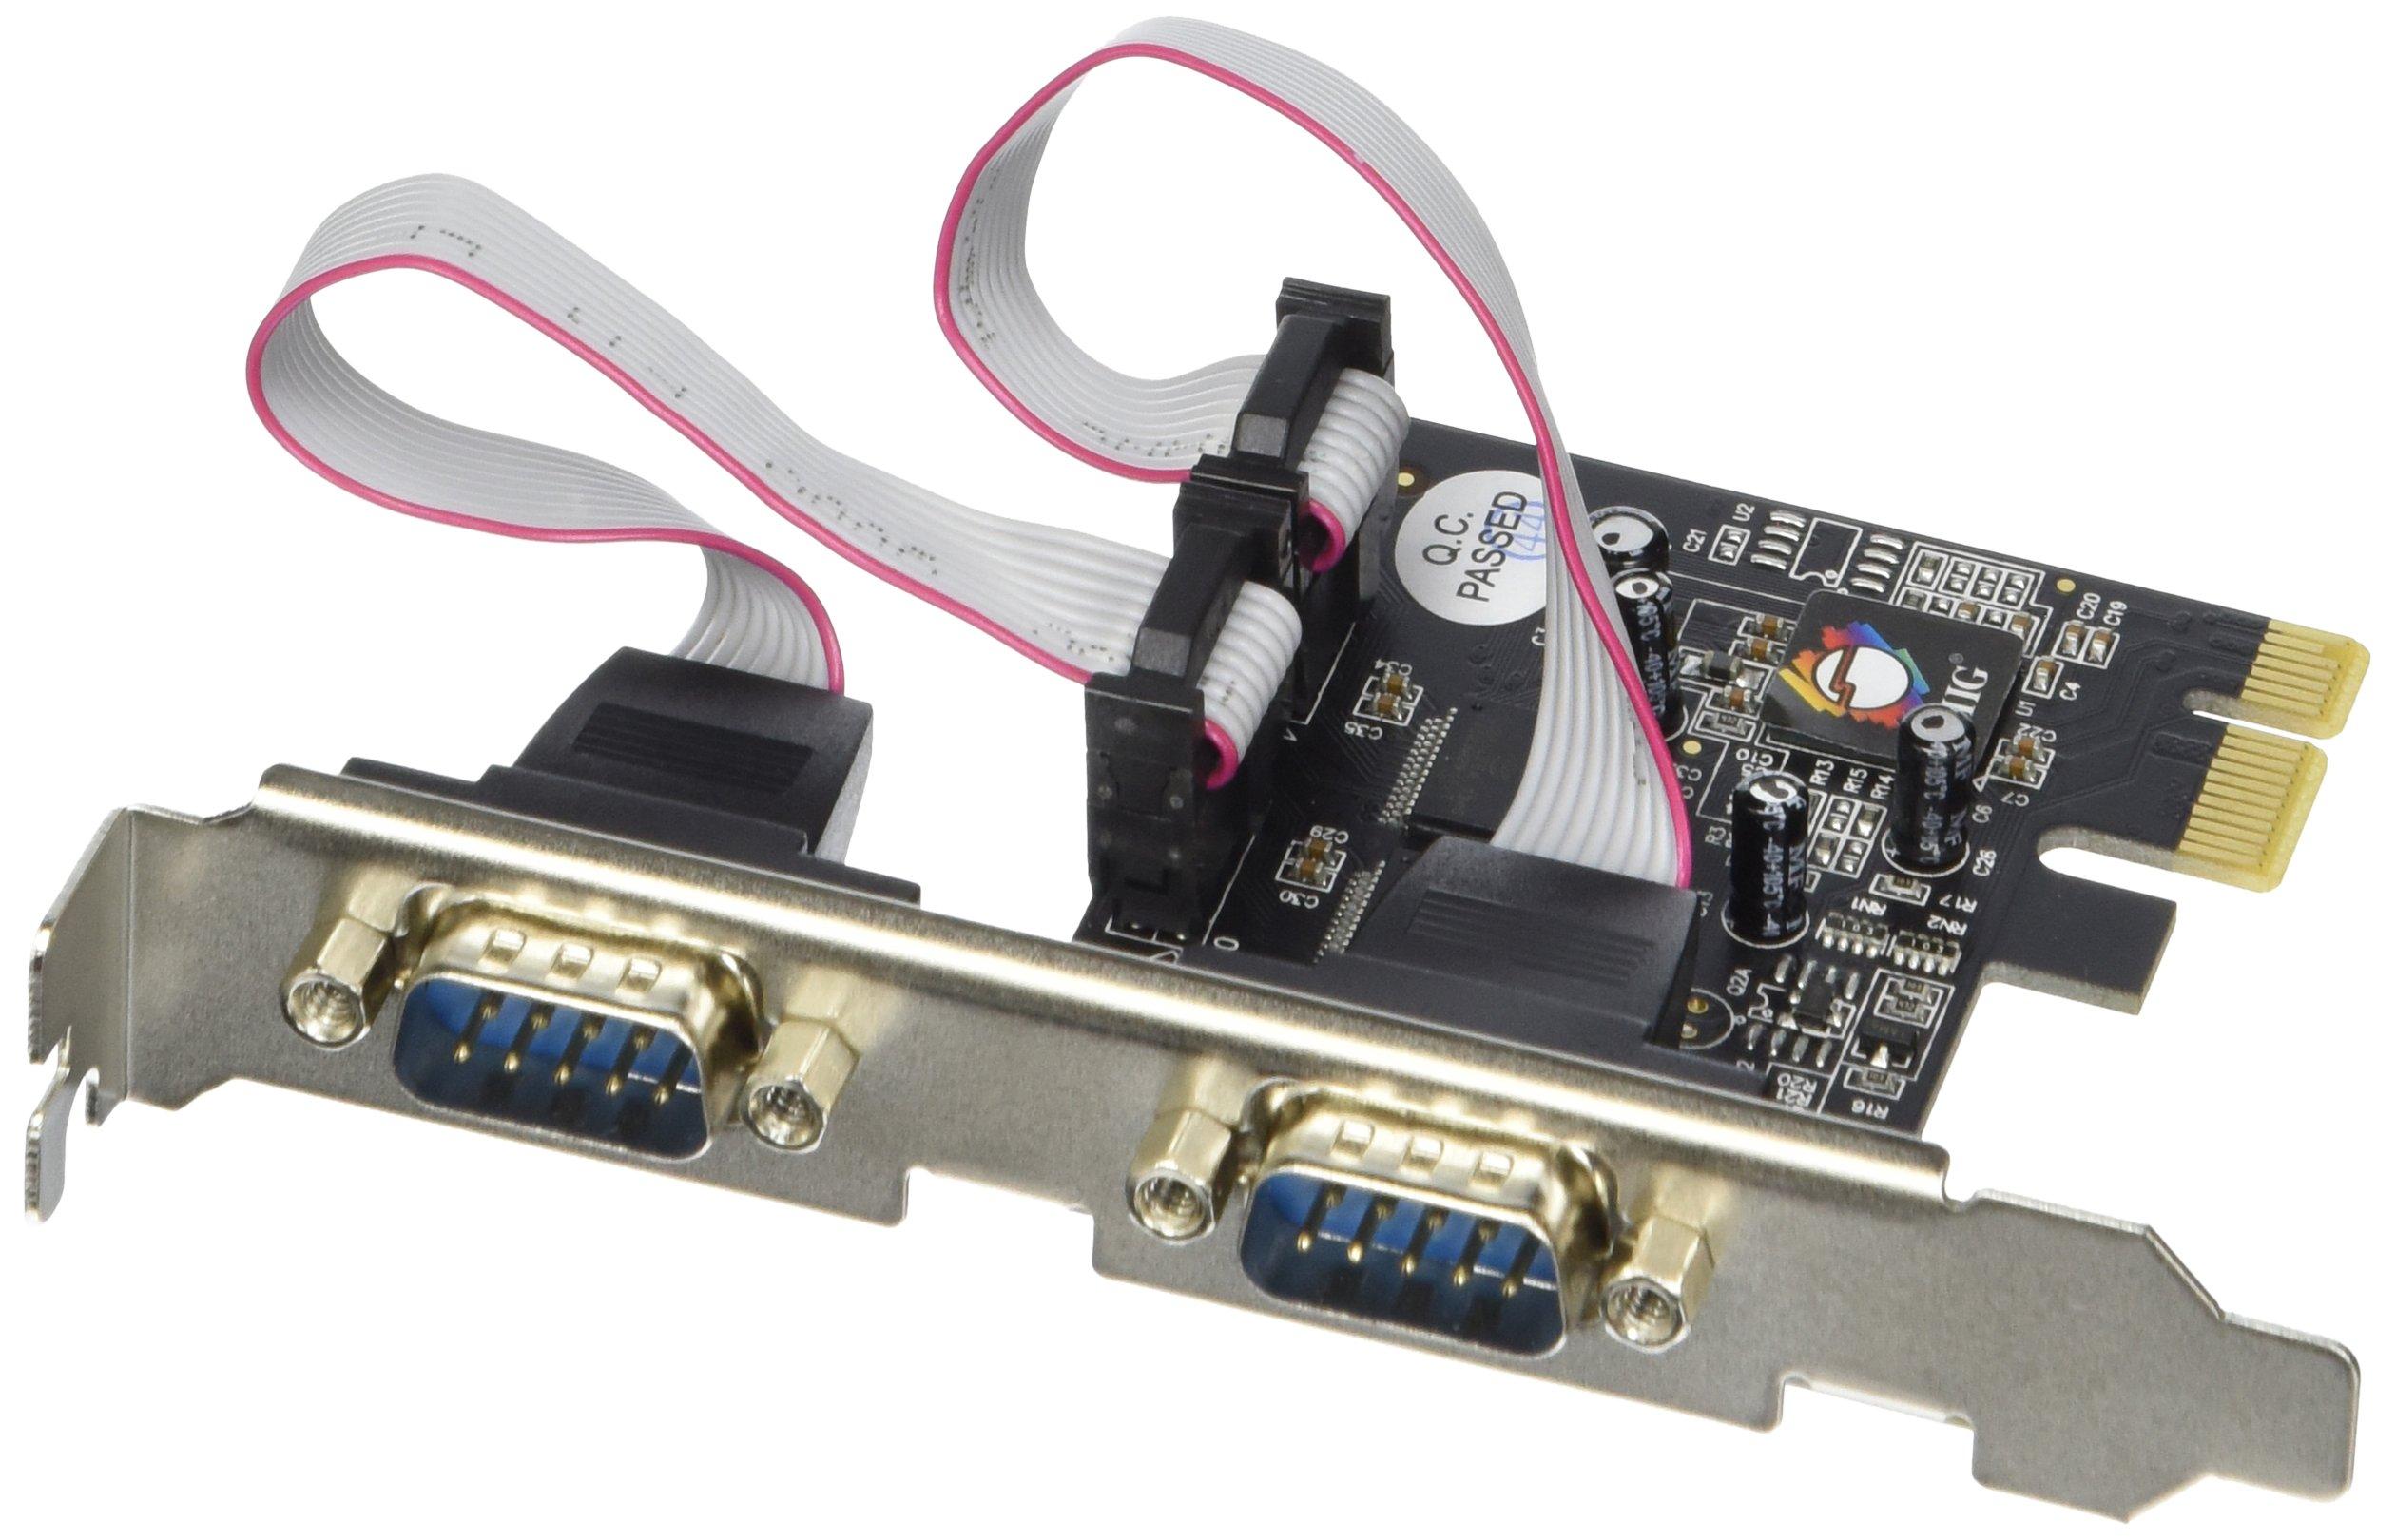 PCIe serial RS232 de 2 puertos SIIG con 16950 UART (JJ-E02111-S1)